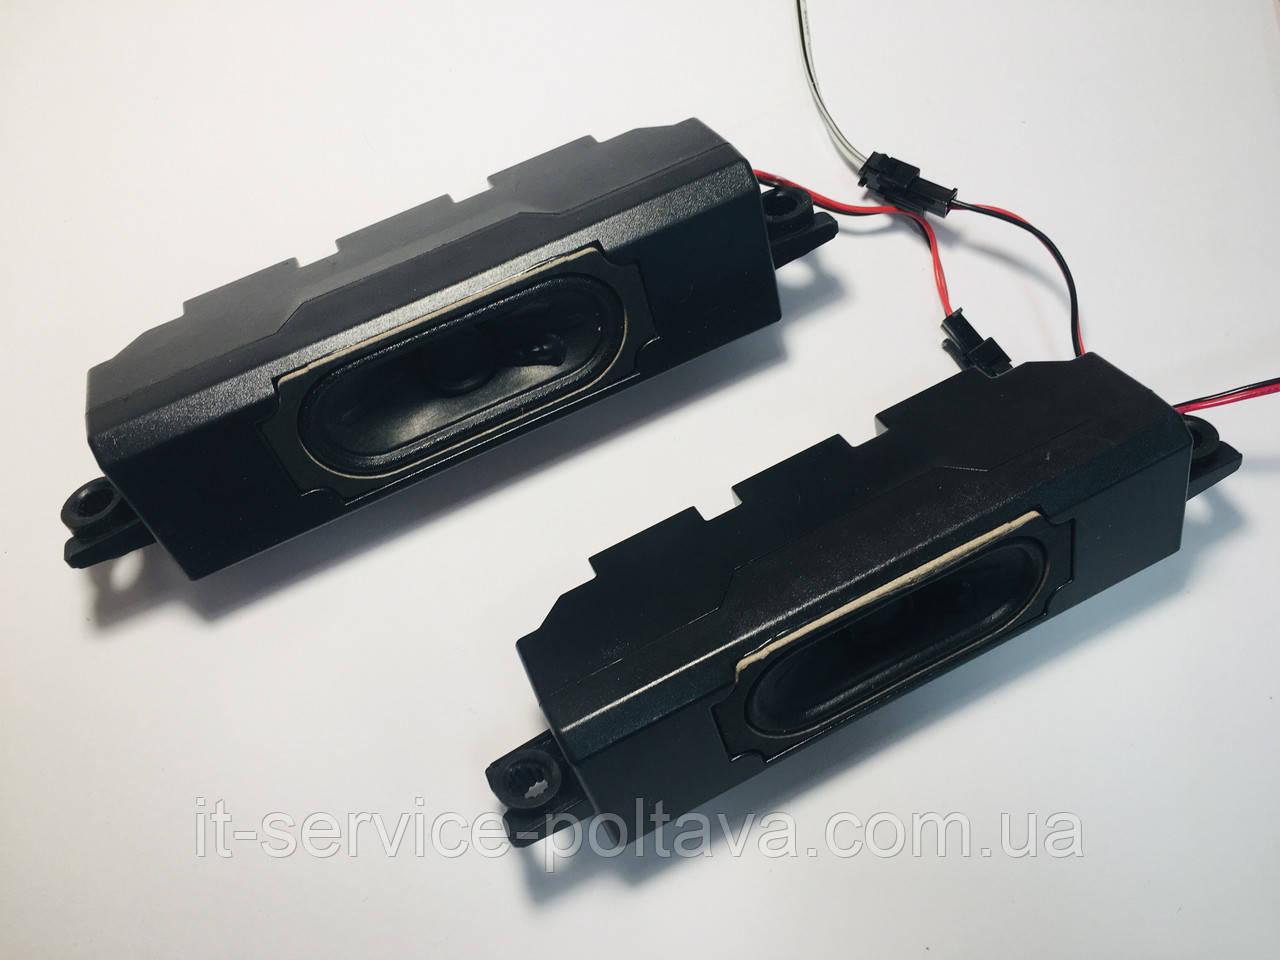 Динаміки 42-WDF061-XM1G 6Om 12W Xiaomi L55M5-5ARU